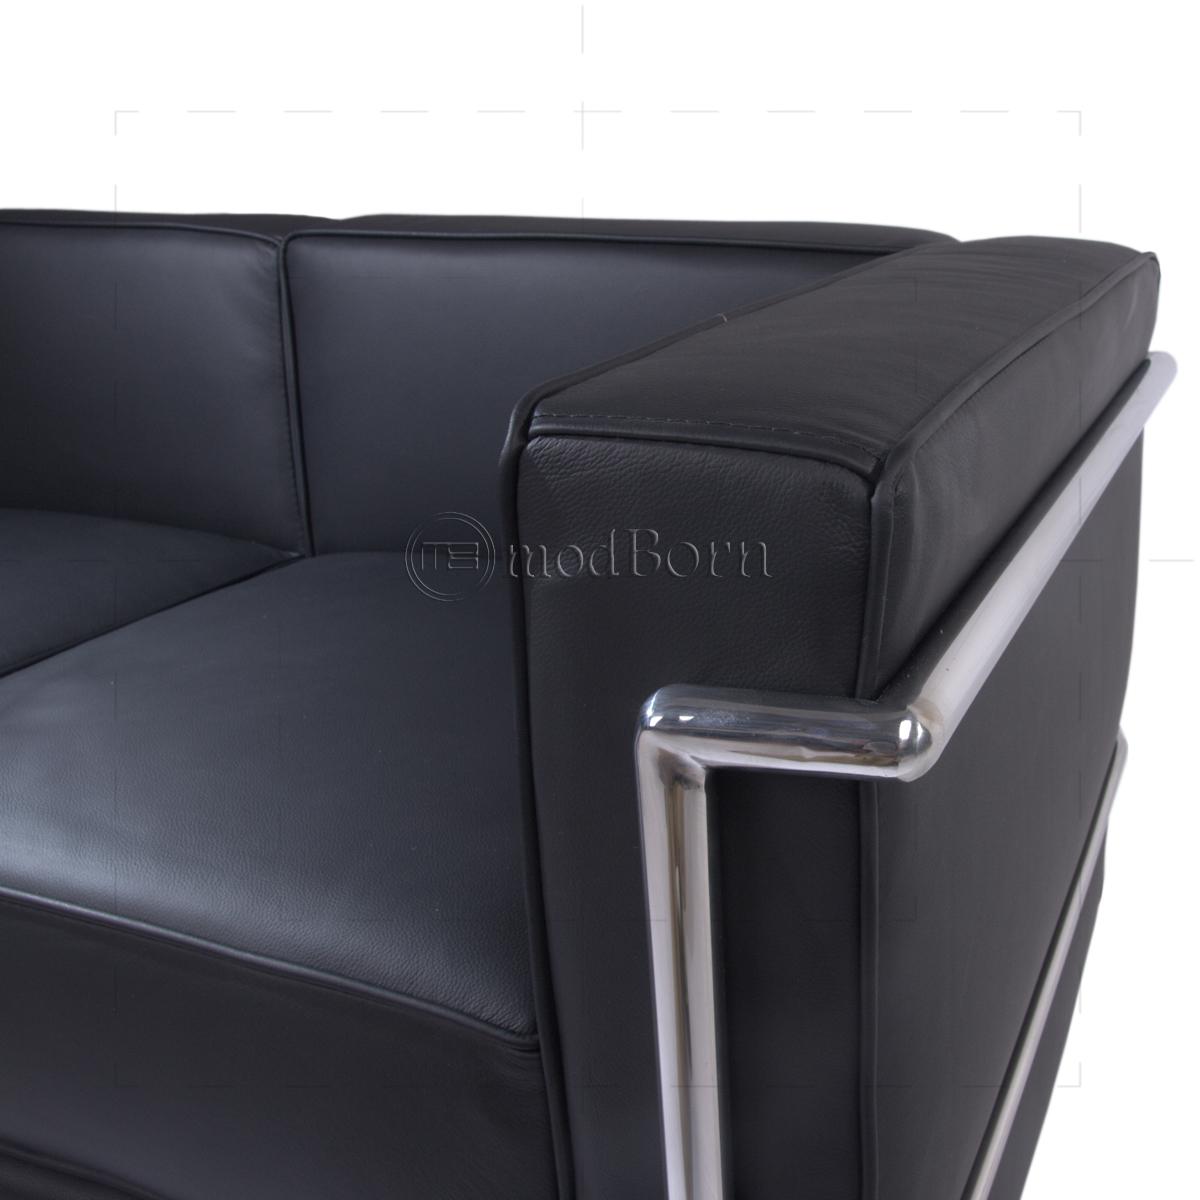 le corbusier style lc2 sofa 3 seater black leather replica. Black Bedroom Furniture Sets. Home Design Ideas